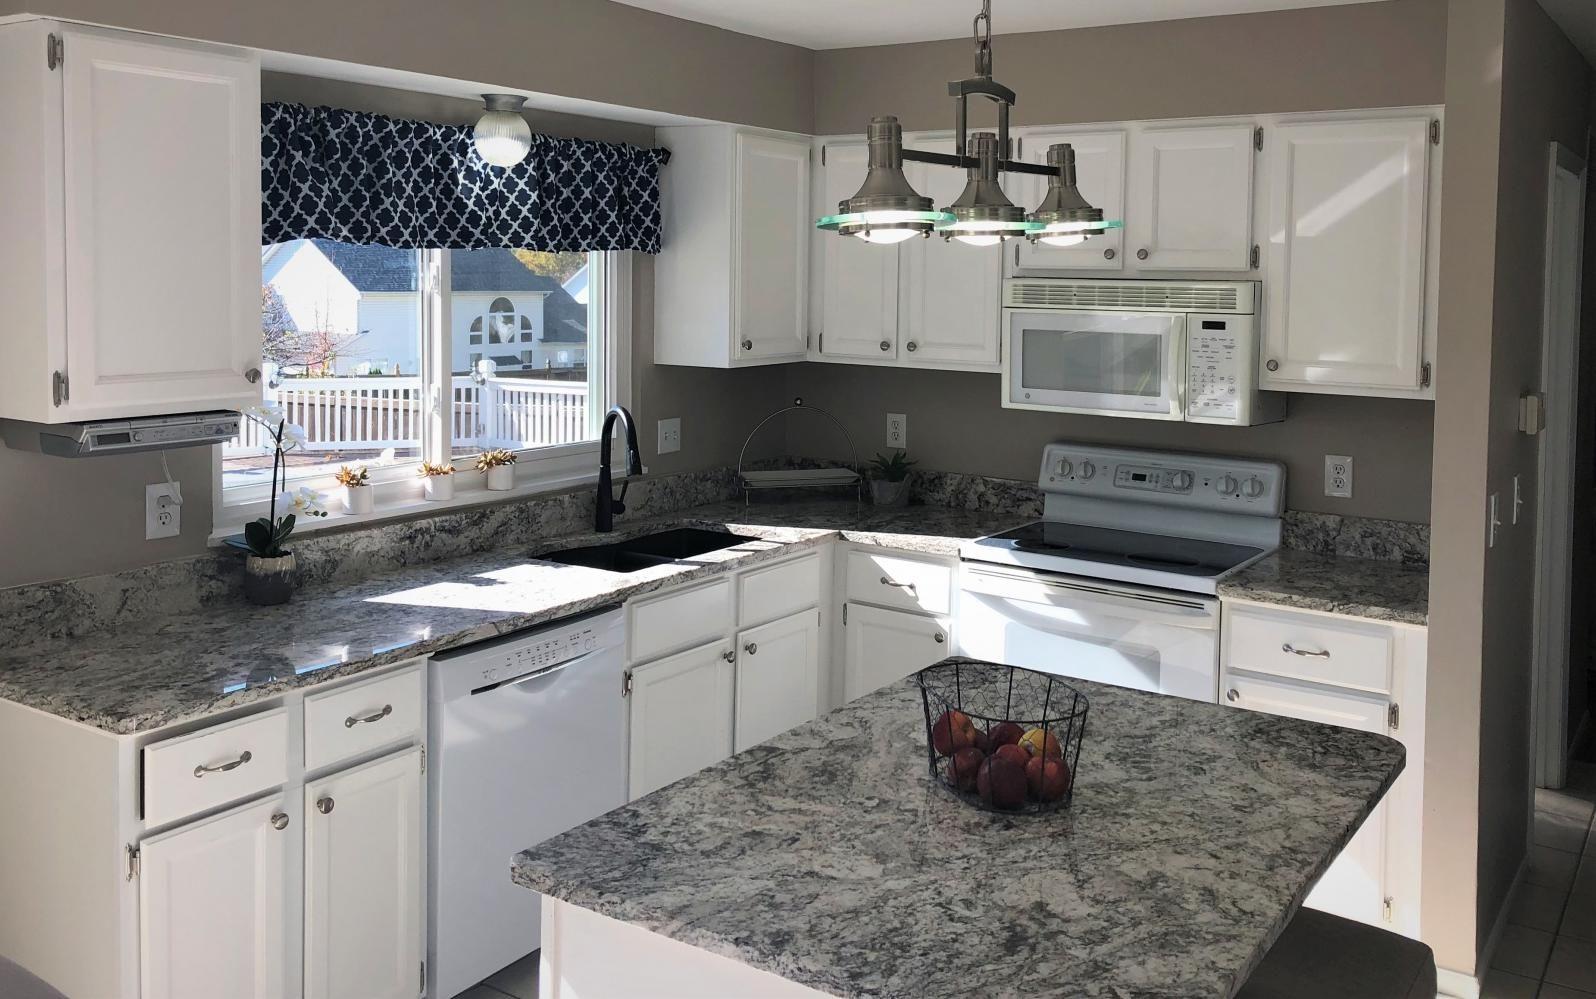 Bhhs Select Properties Kerri Lyell 5 Castlio Court St Charles Mo Mls 18088478 Home Decor Decor Home